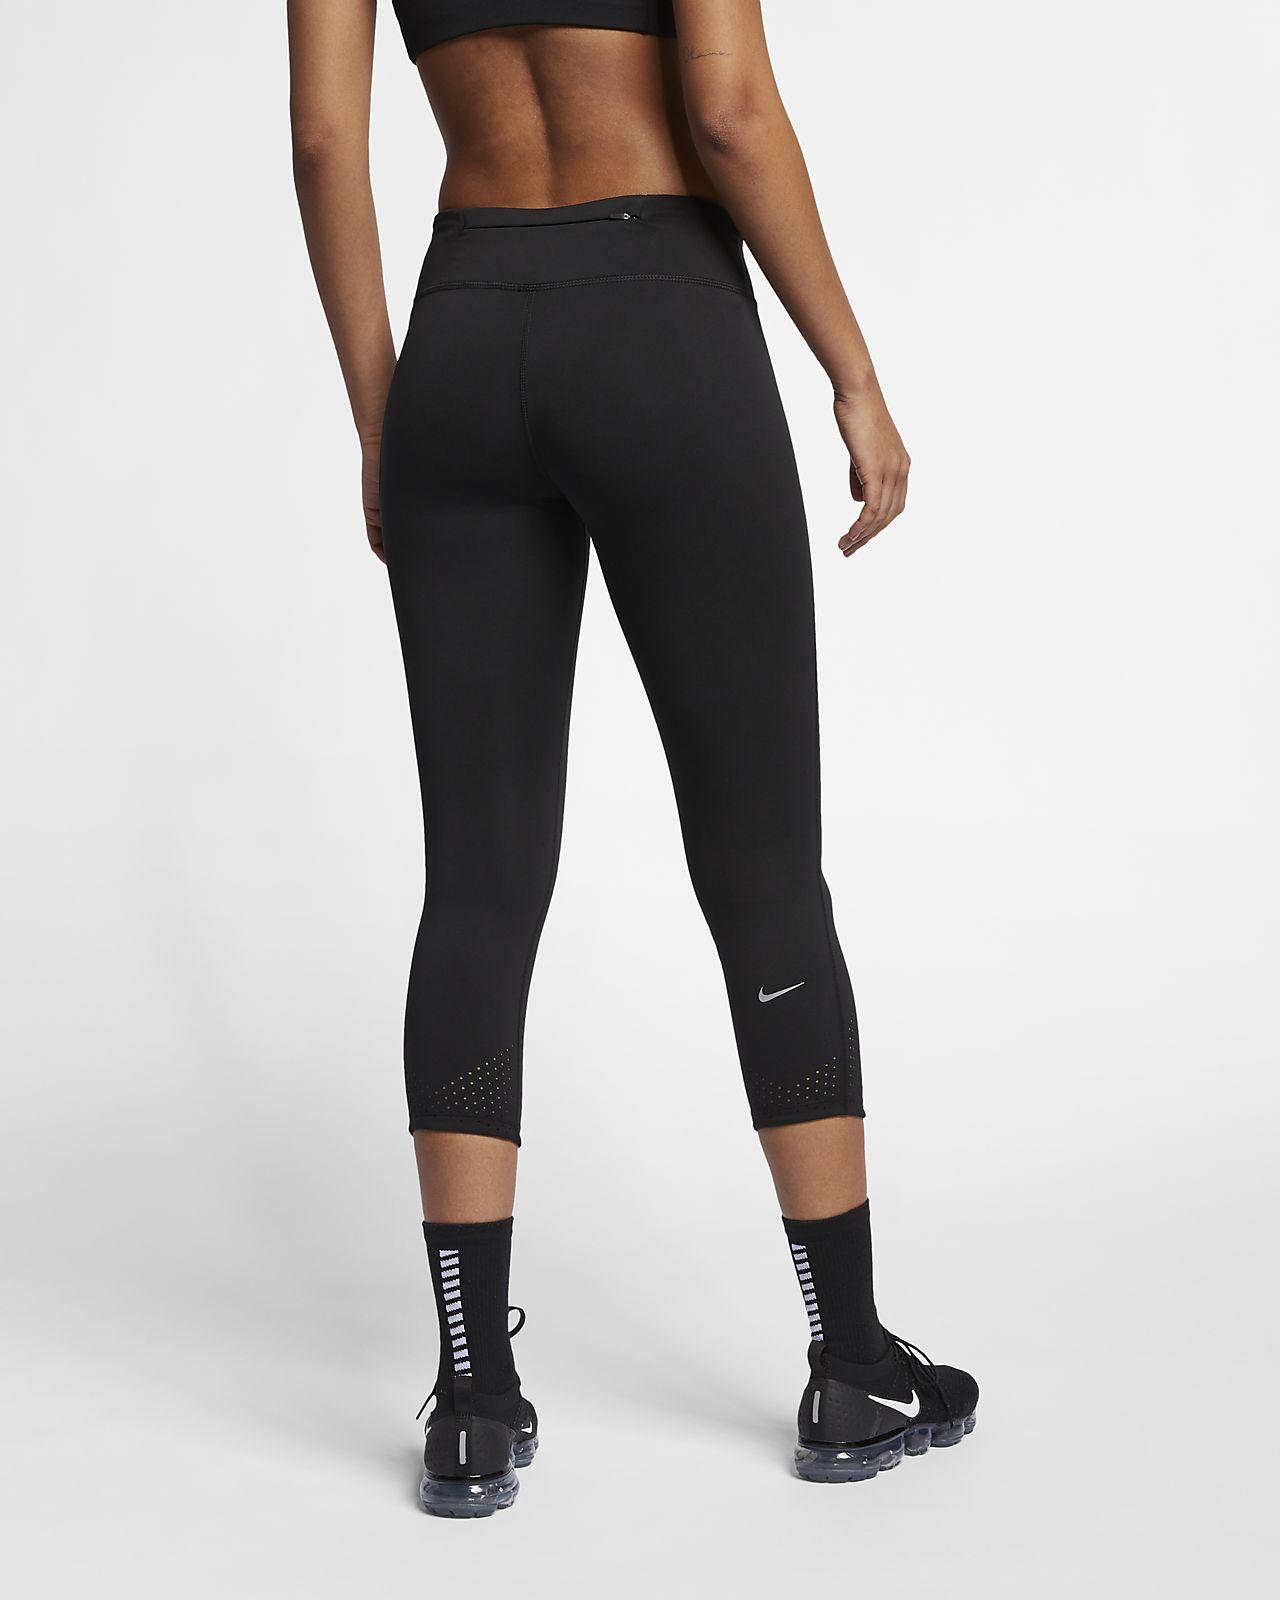 0ad7f9276801b Nike Epic Lux Women's Running Crops. Nike.com AU